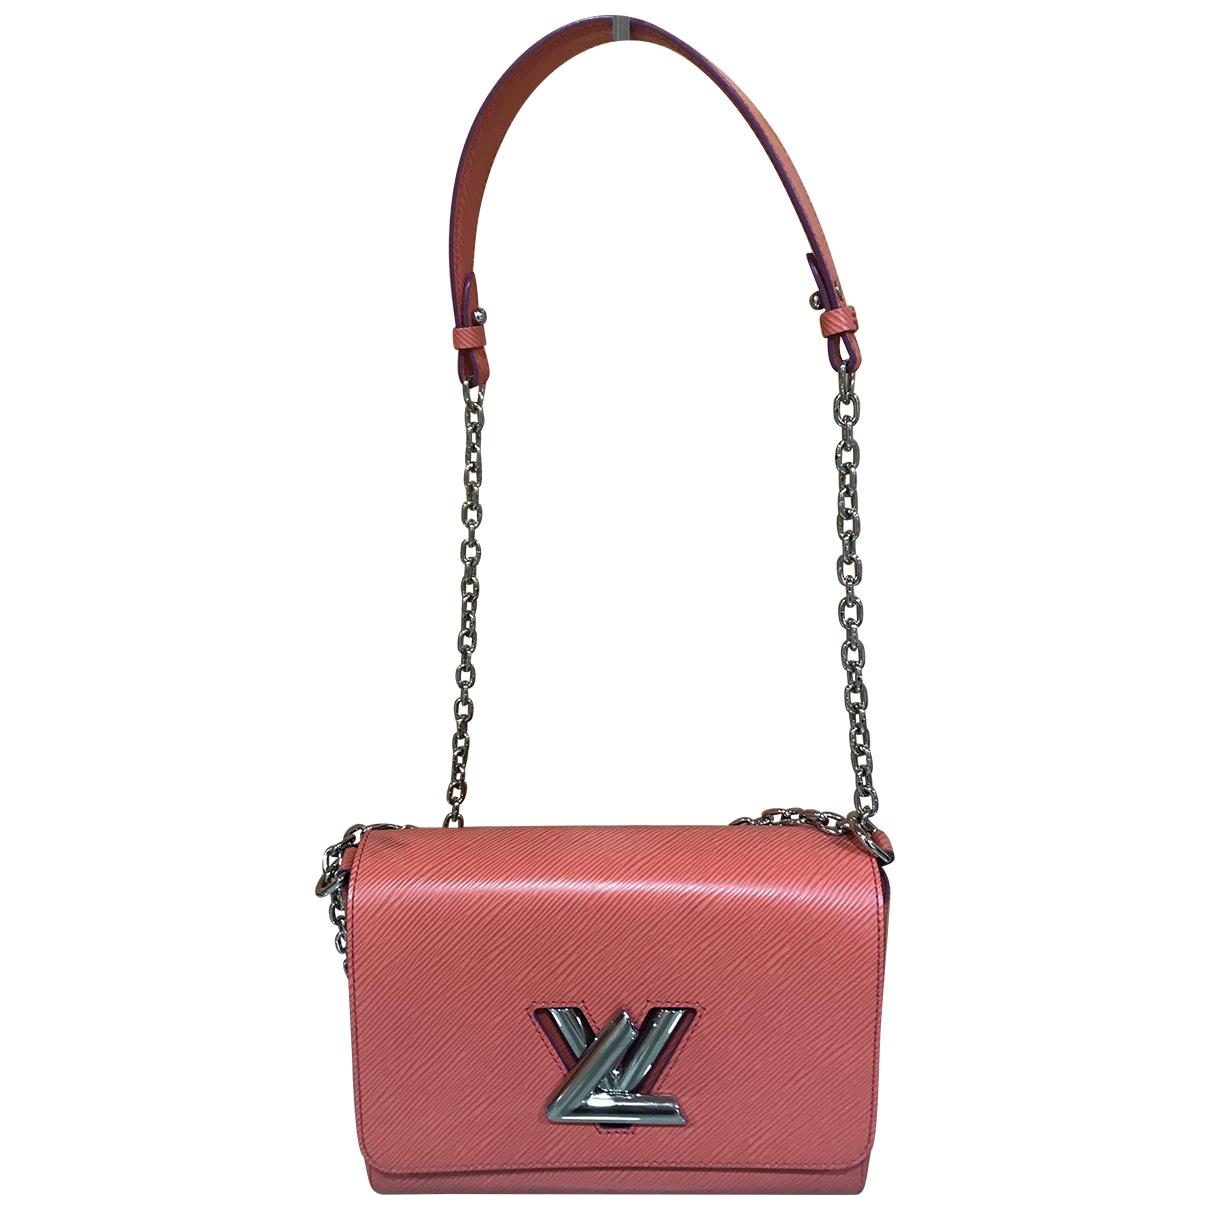 Louis Vuitton Twist Red Leather handbag for Women \N